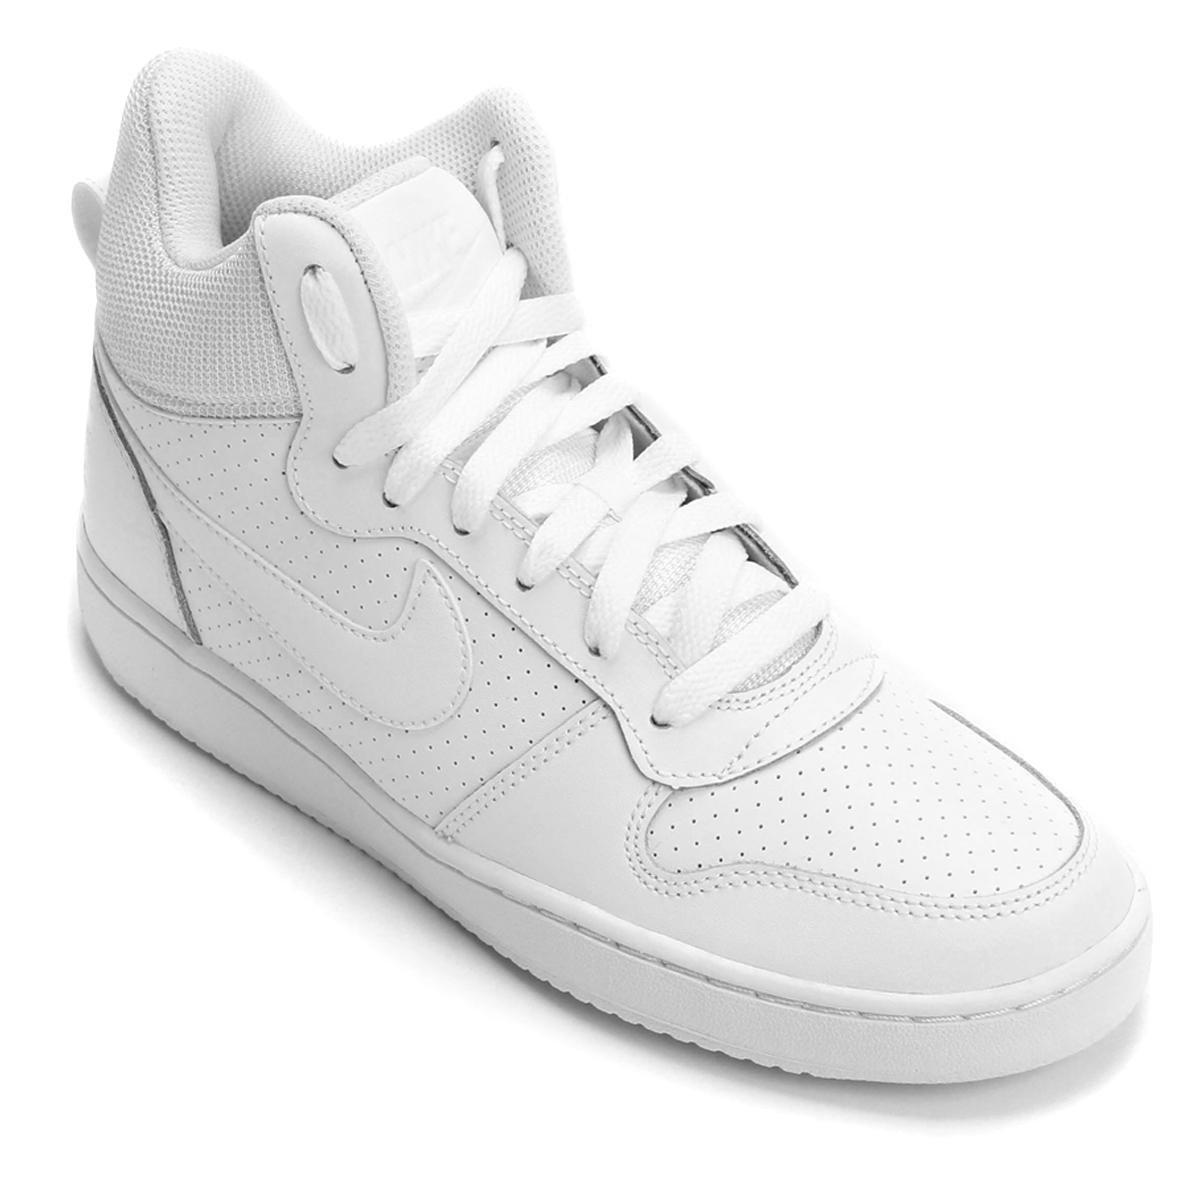 Tênis Couro Cano Alto Nike Recreation Mid Feminino Branco